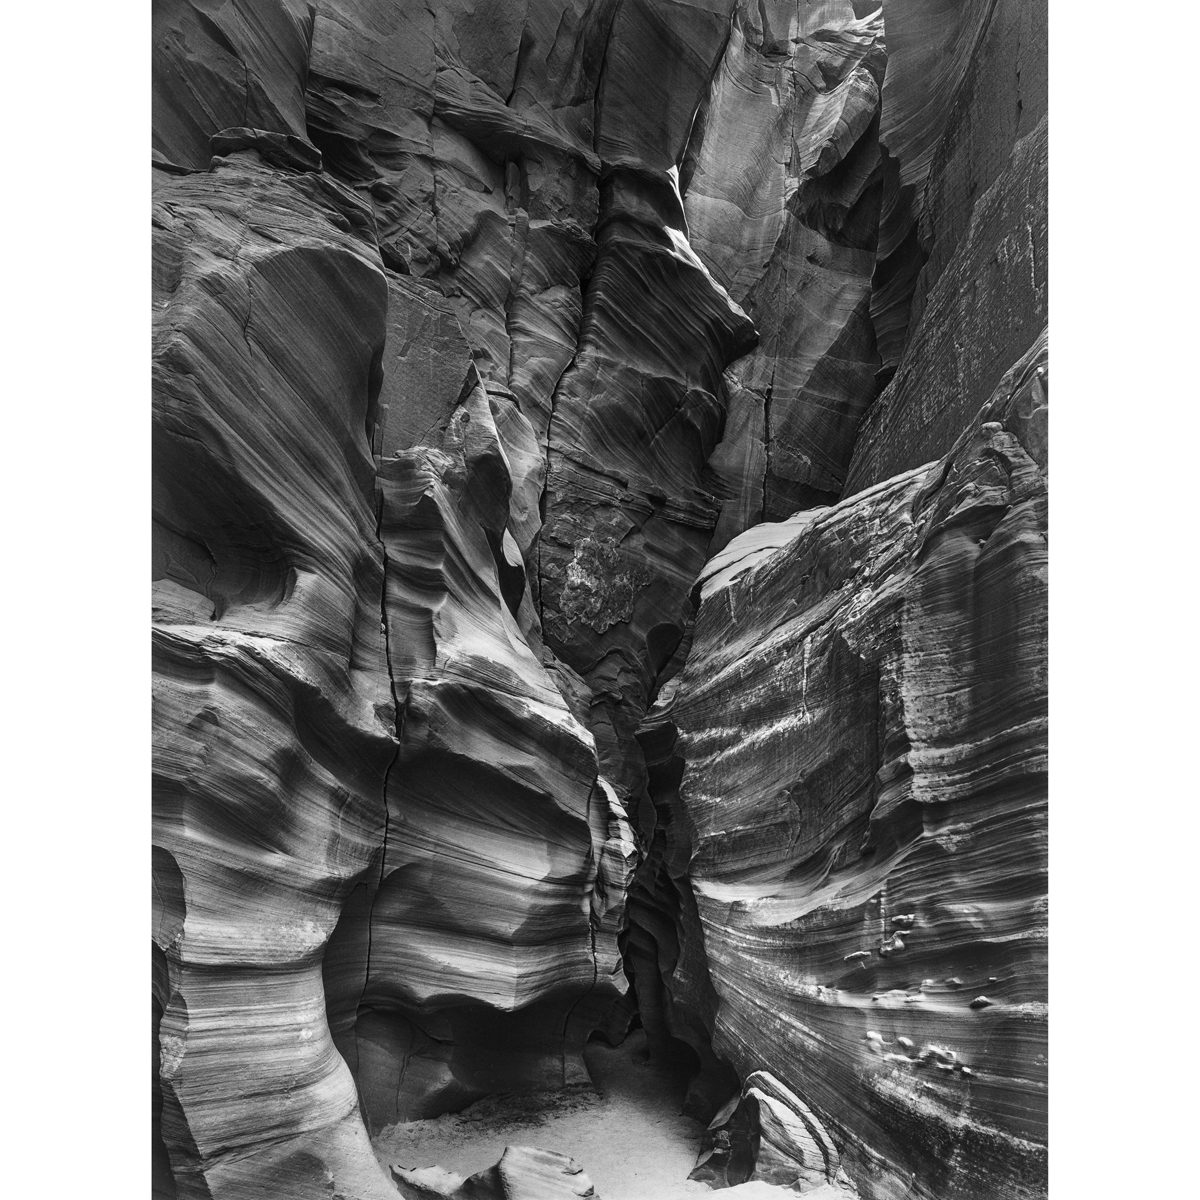 007-2016-Arca-Swiss-4x5-Antelope-canyon-USA-MGFB-Classis-1K by Max Bedov